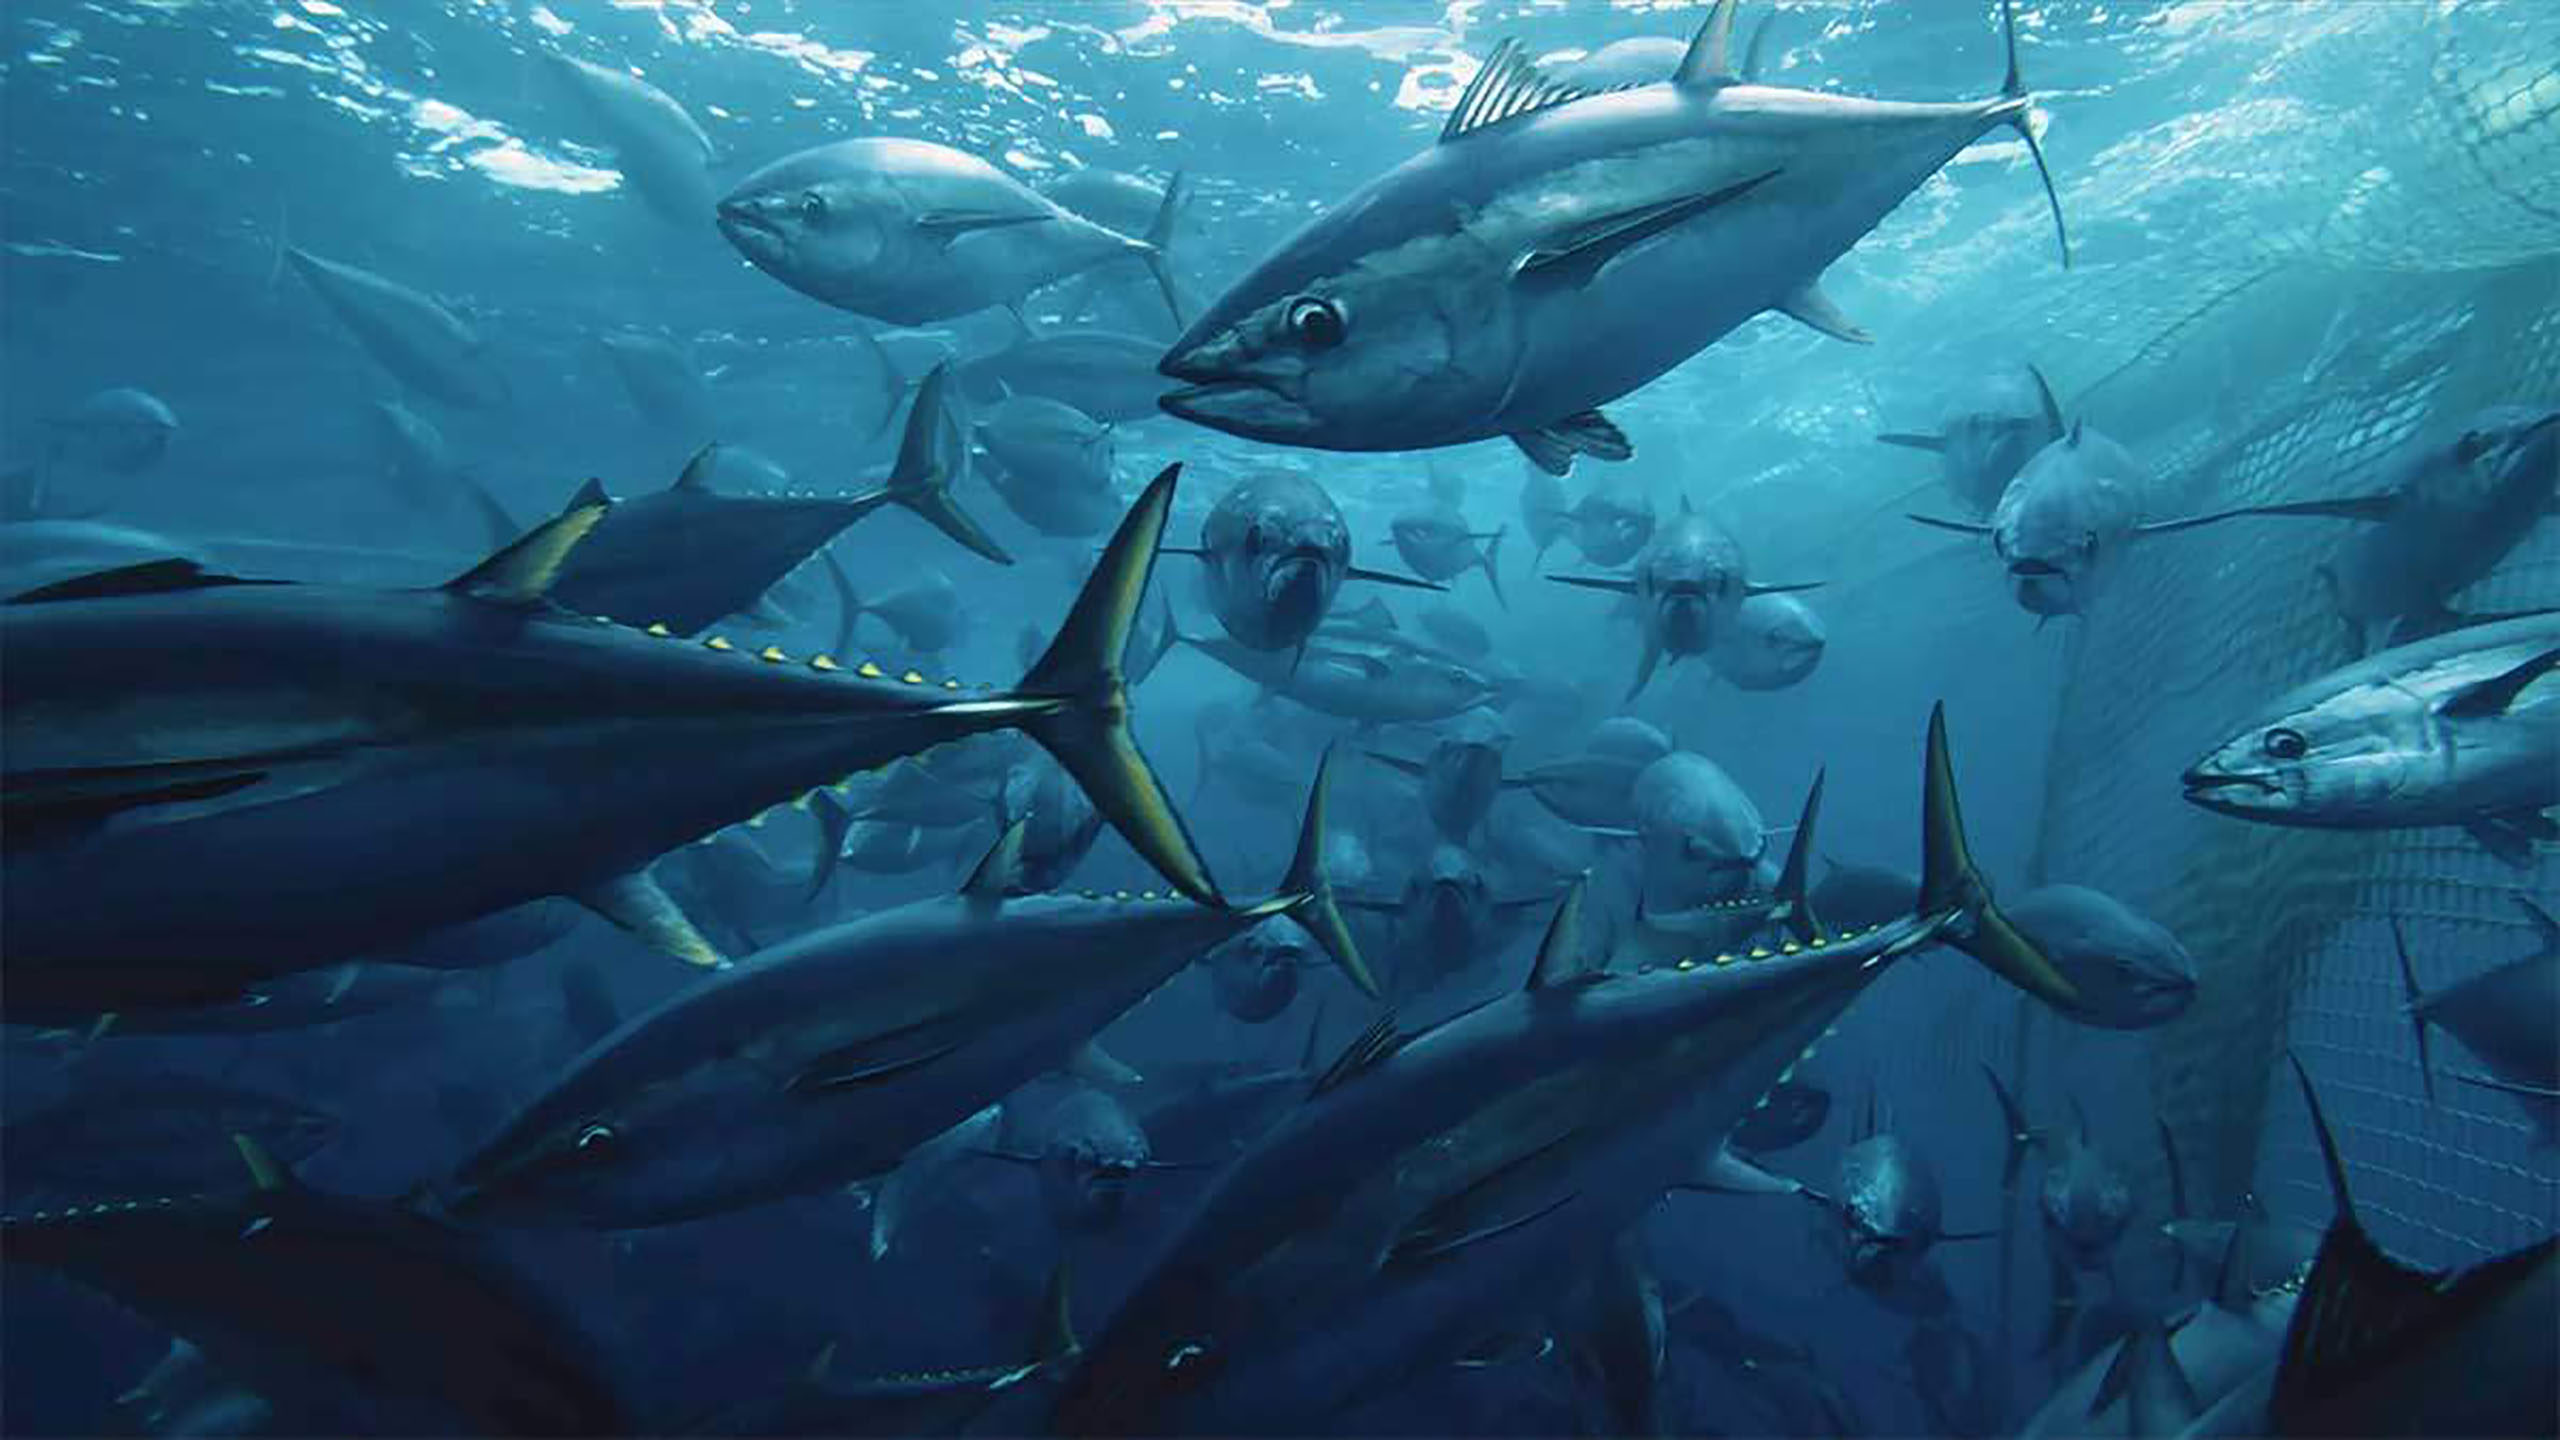 pesca, pesca sustentable, documental, Seaspiracy